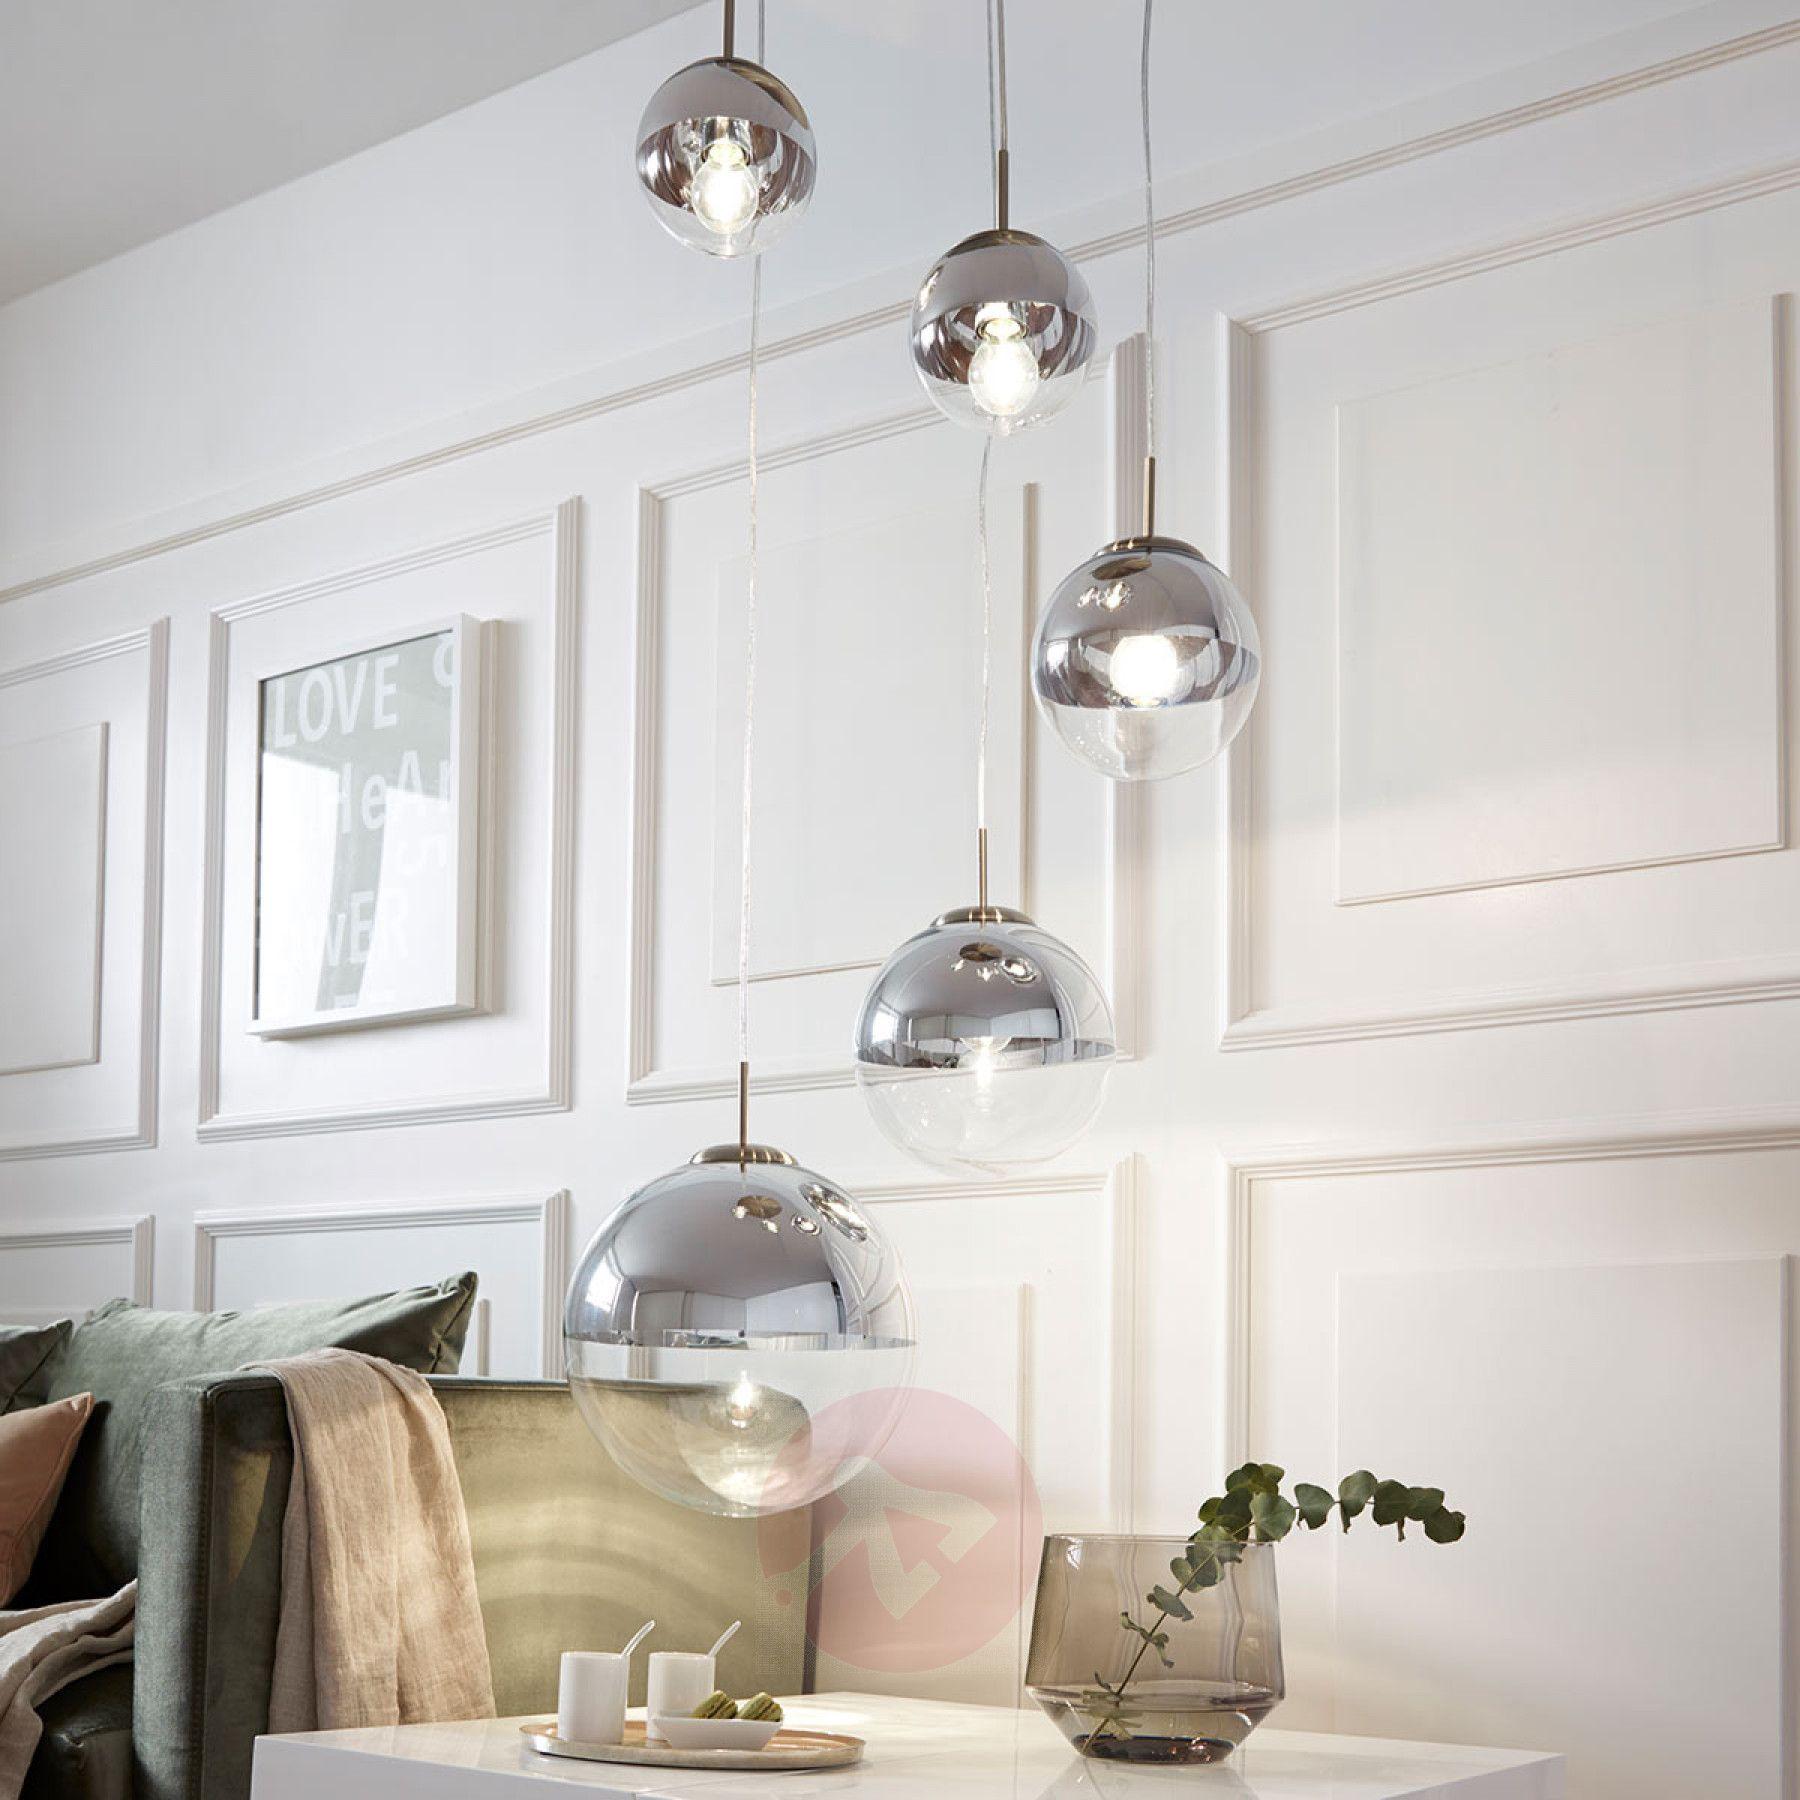 Lampa Wiszaca Ravena Kule Szklane 5 Punktowa Lampy Pl Pendant Light Room Lights Buy Pendant Lights